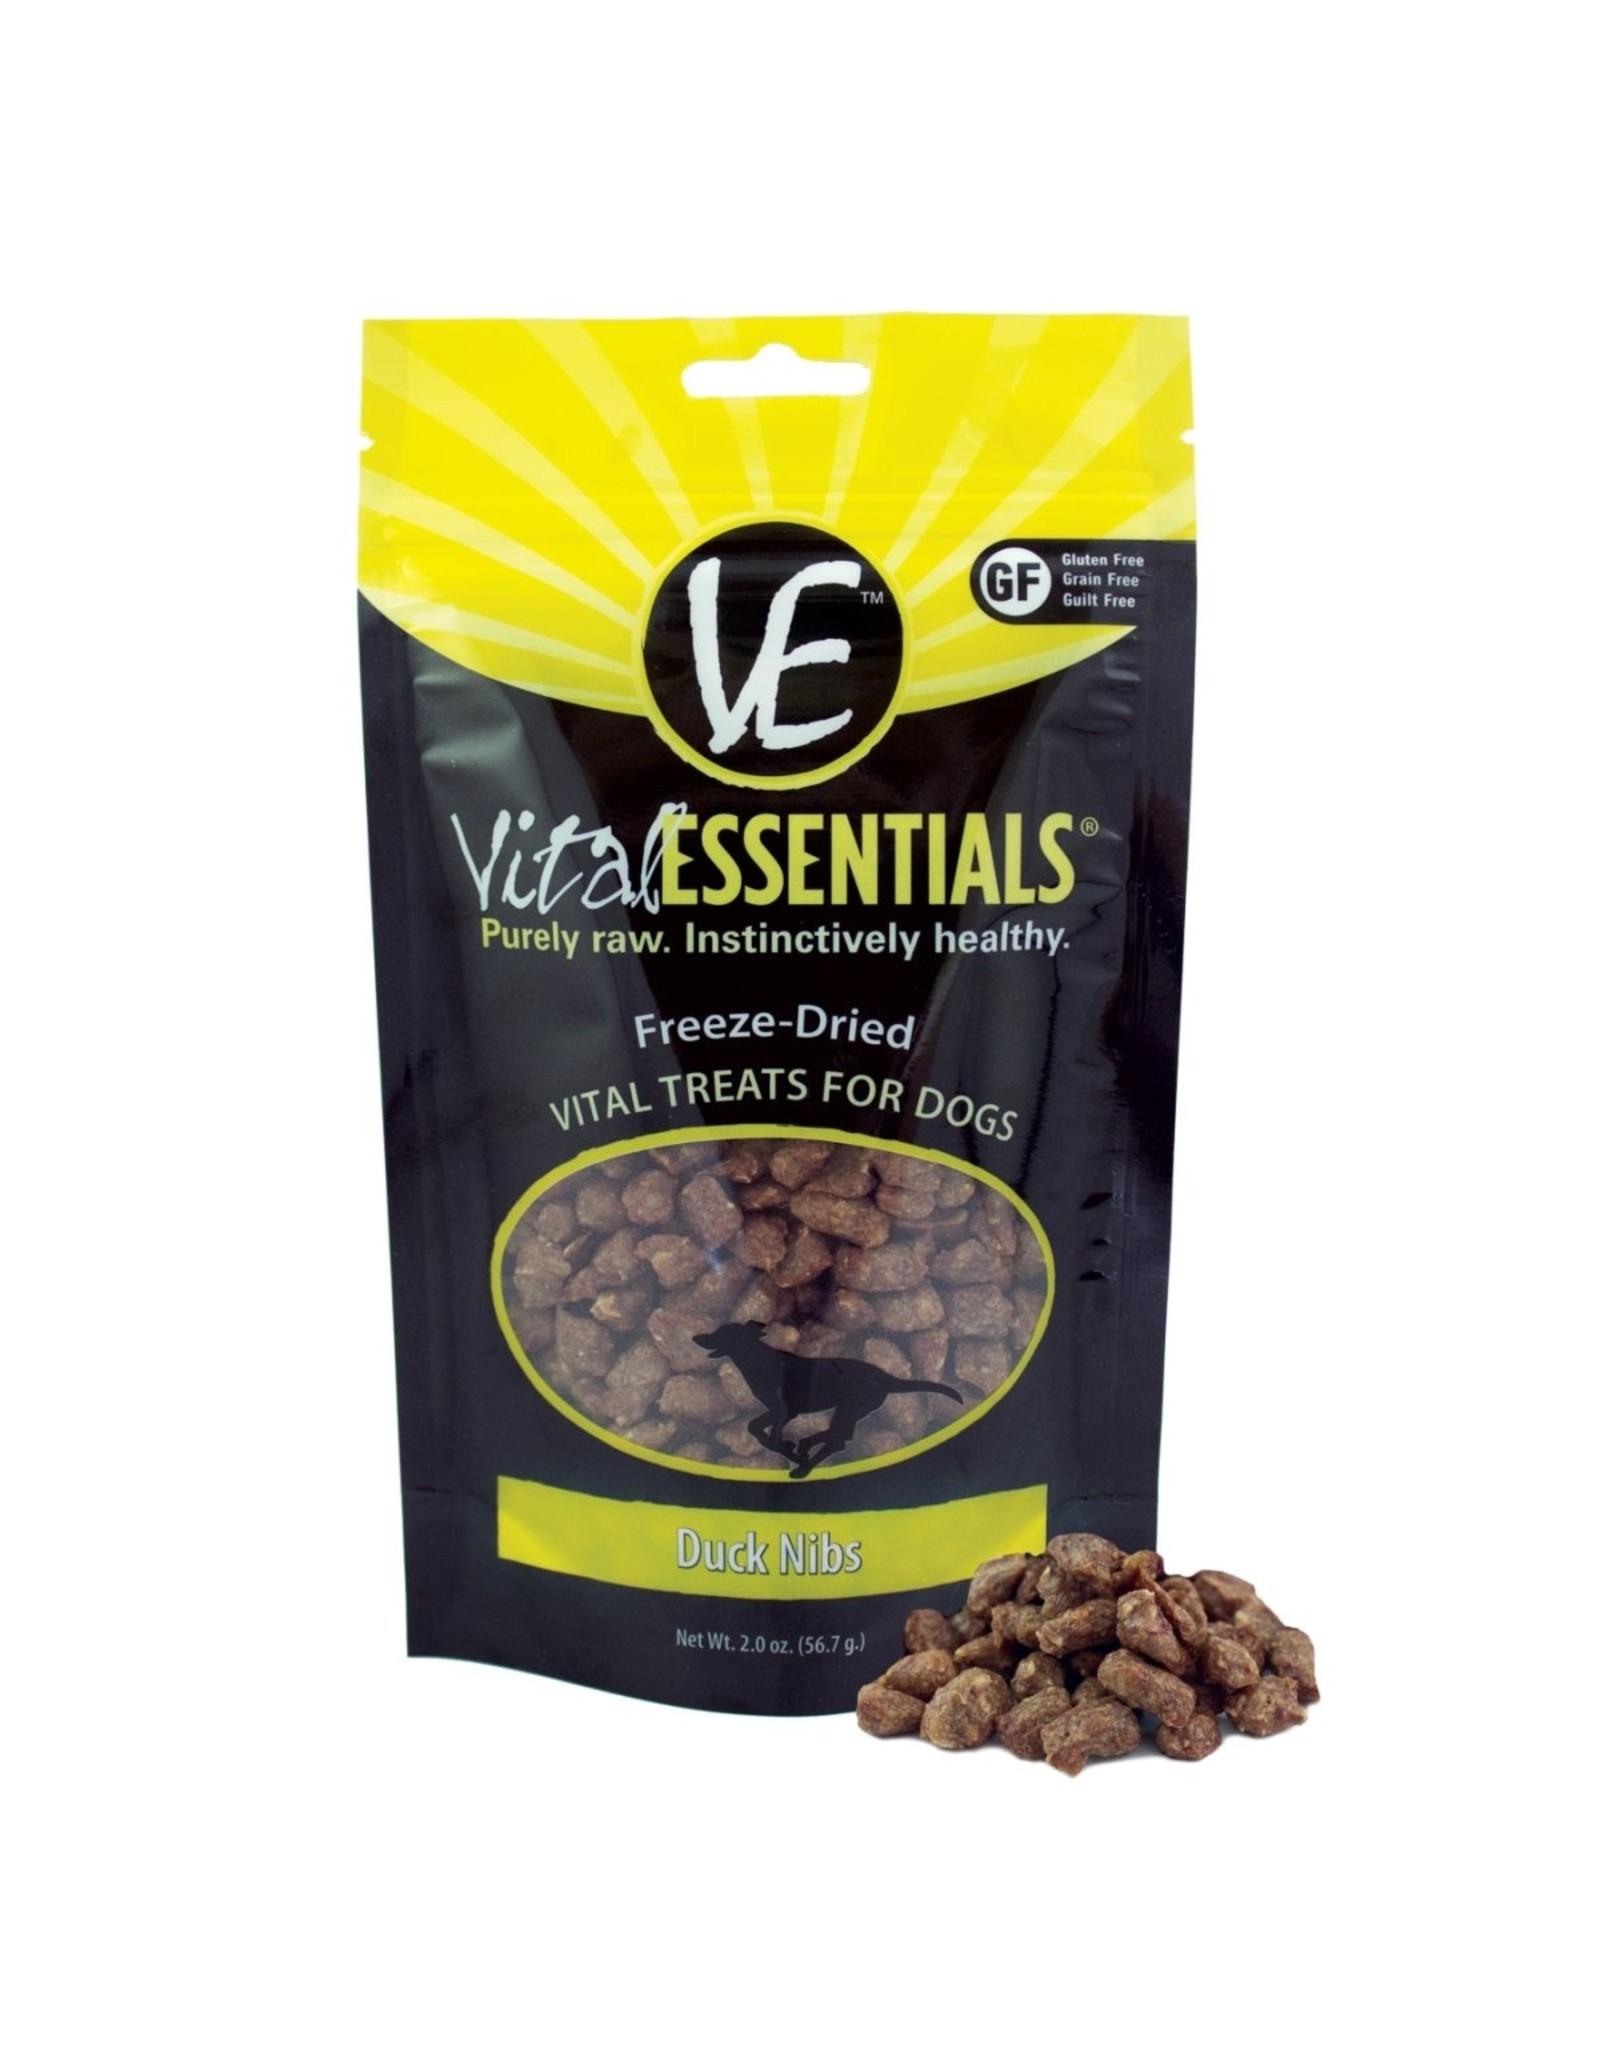 Vital Essentials VITAL ESSENTIALS FREEZE-DRIED DUCK NIBS TREATS FOR DOGS 2OZ